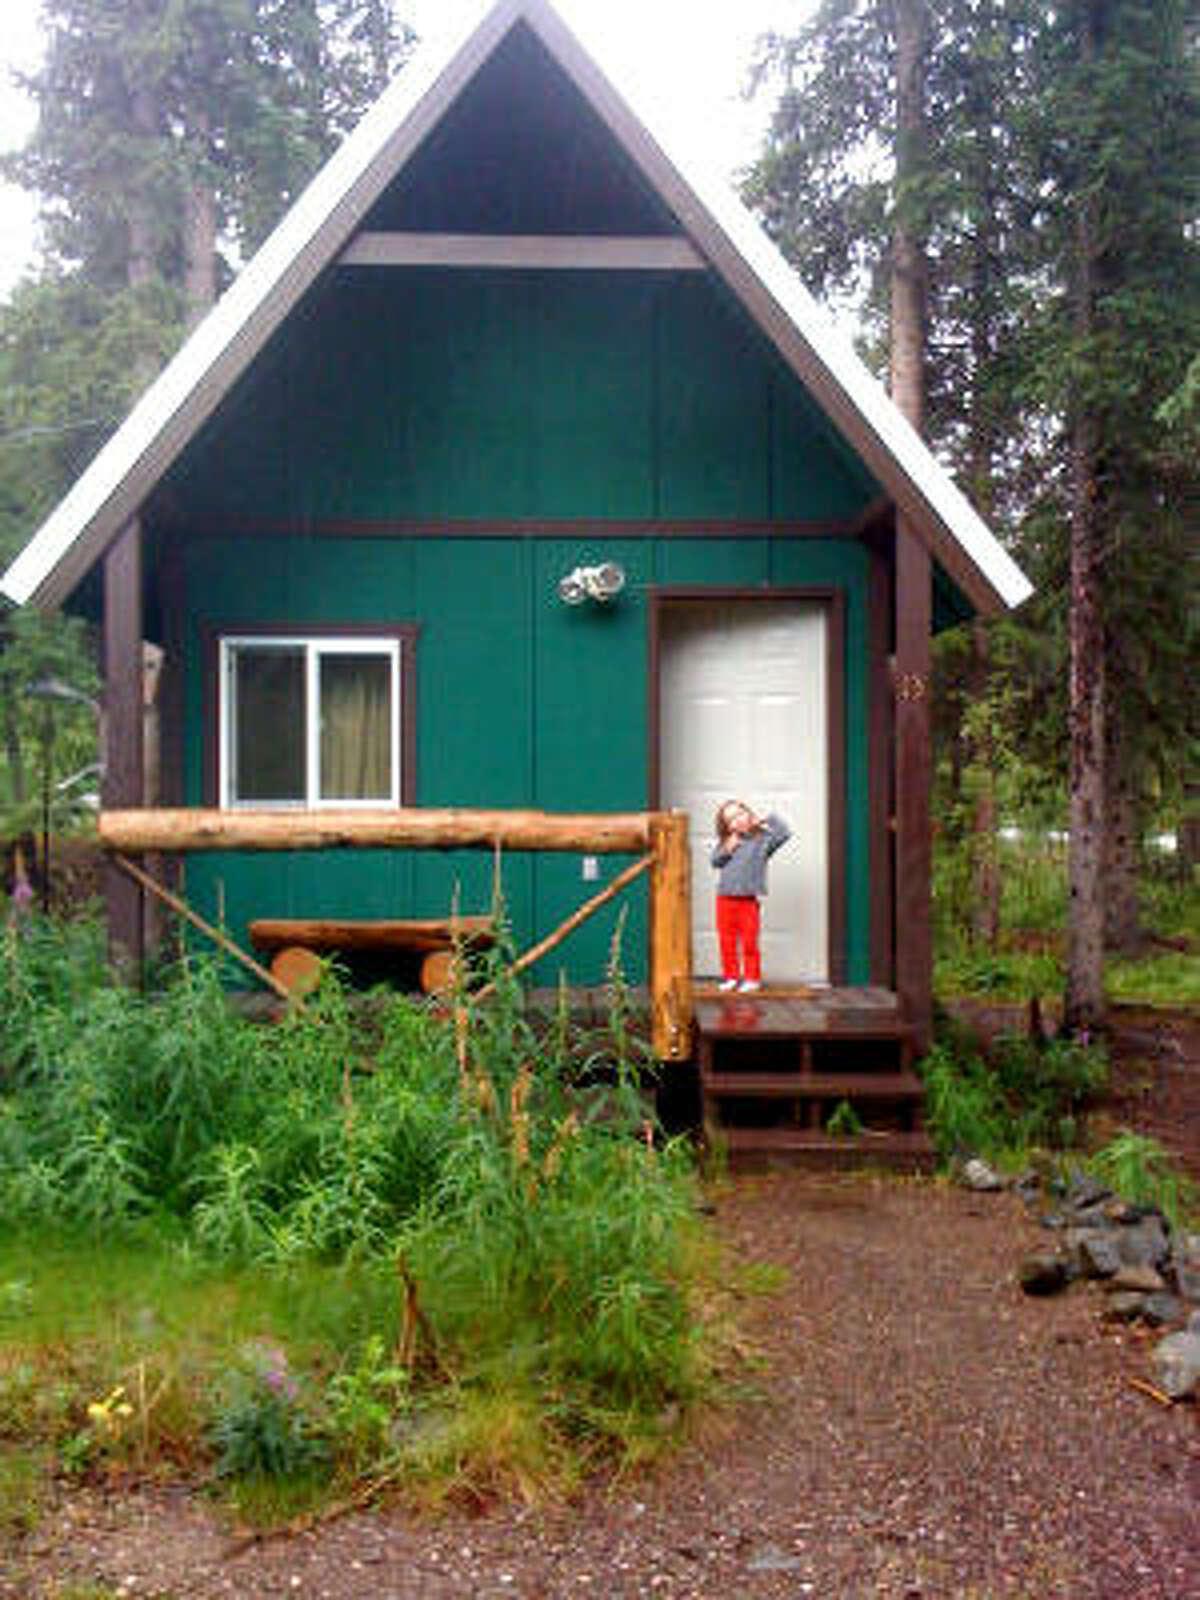 Our cabin near Denali. This photo was taken around 10 p.m.